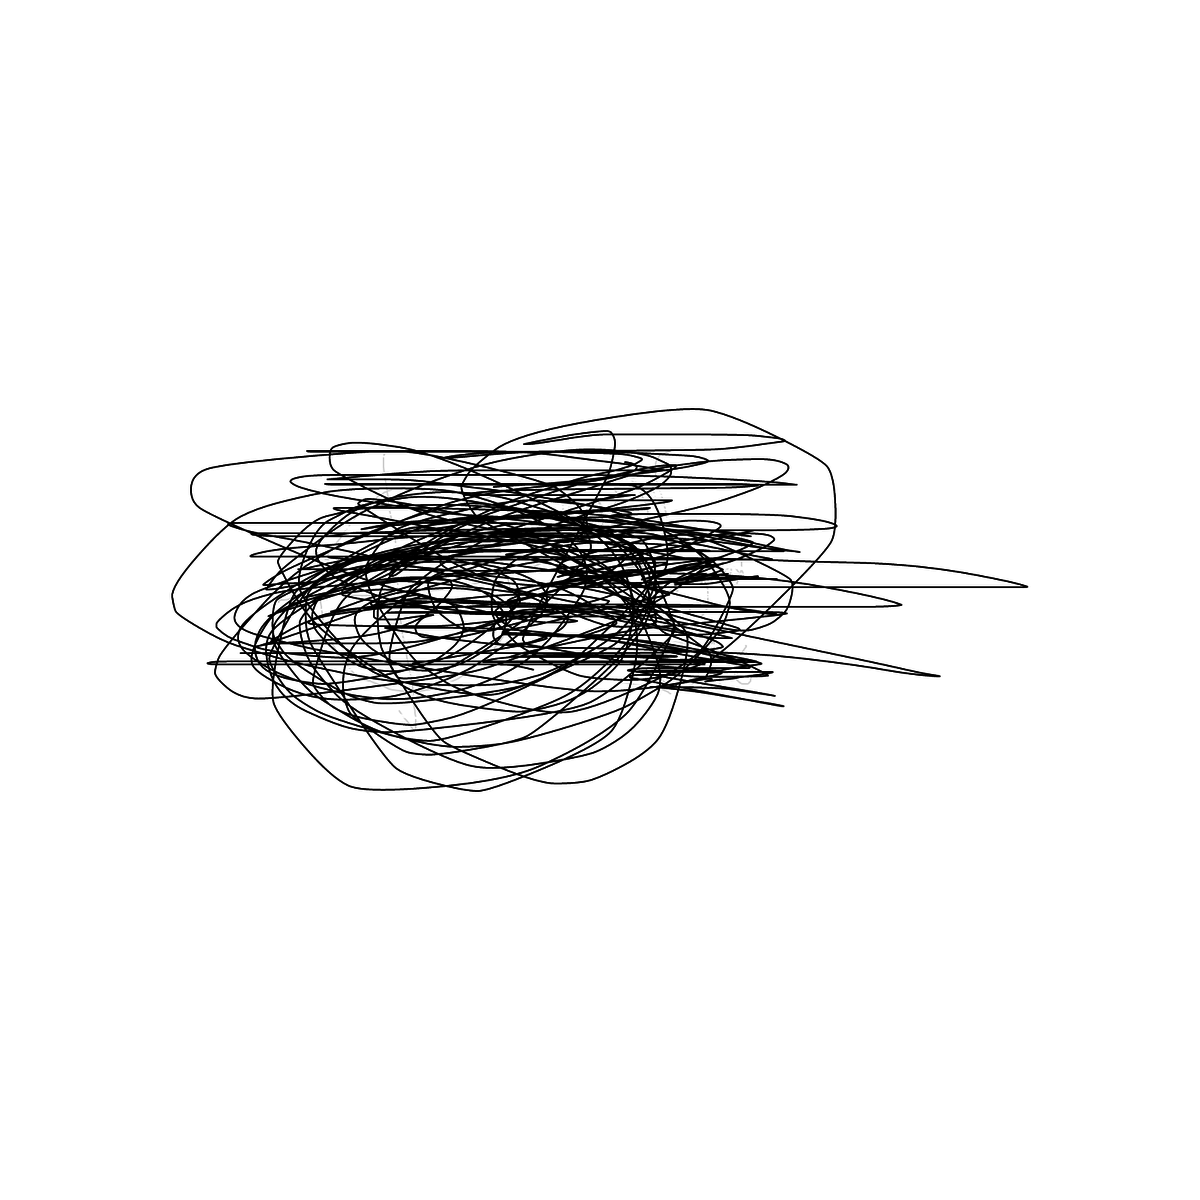 BAAAM drawing#13489 lat:59.2245063781738300lng: 10.4047679901123050